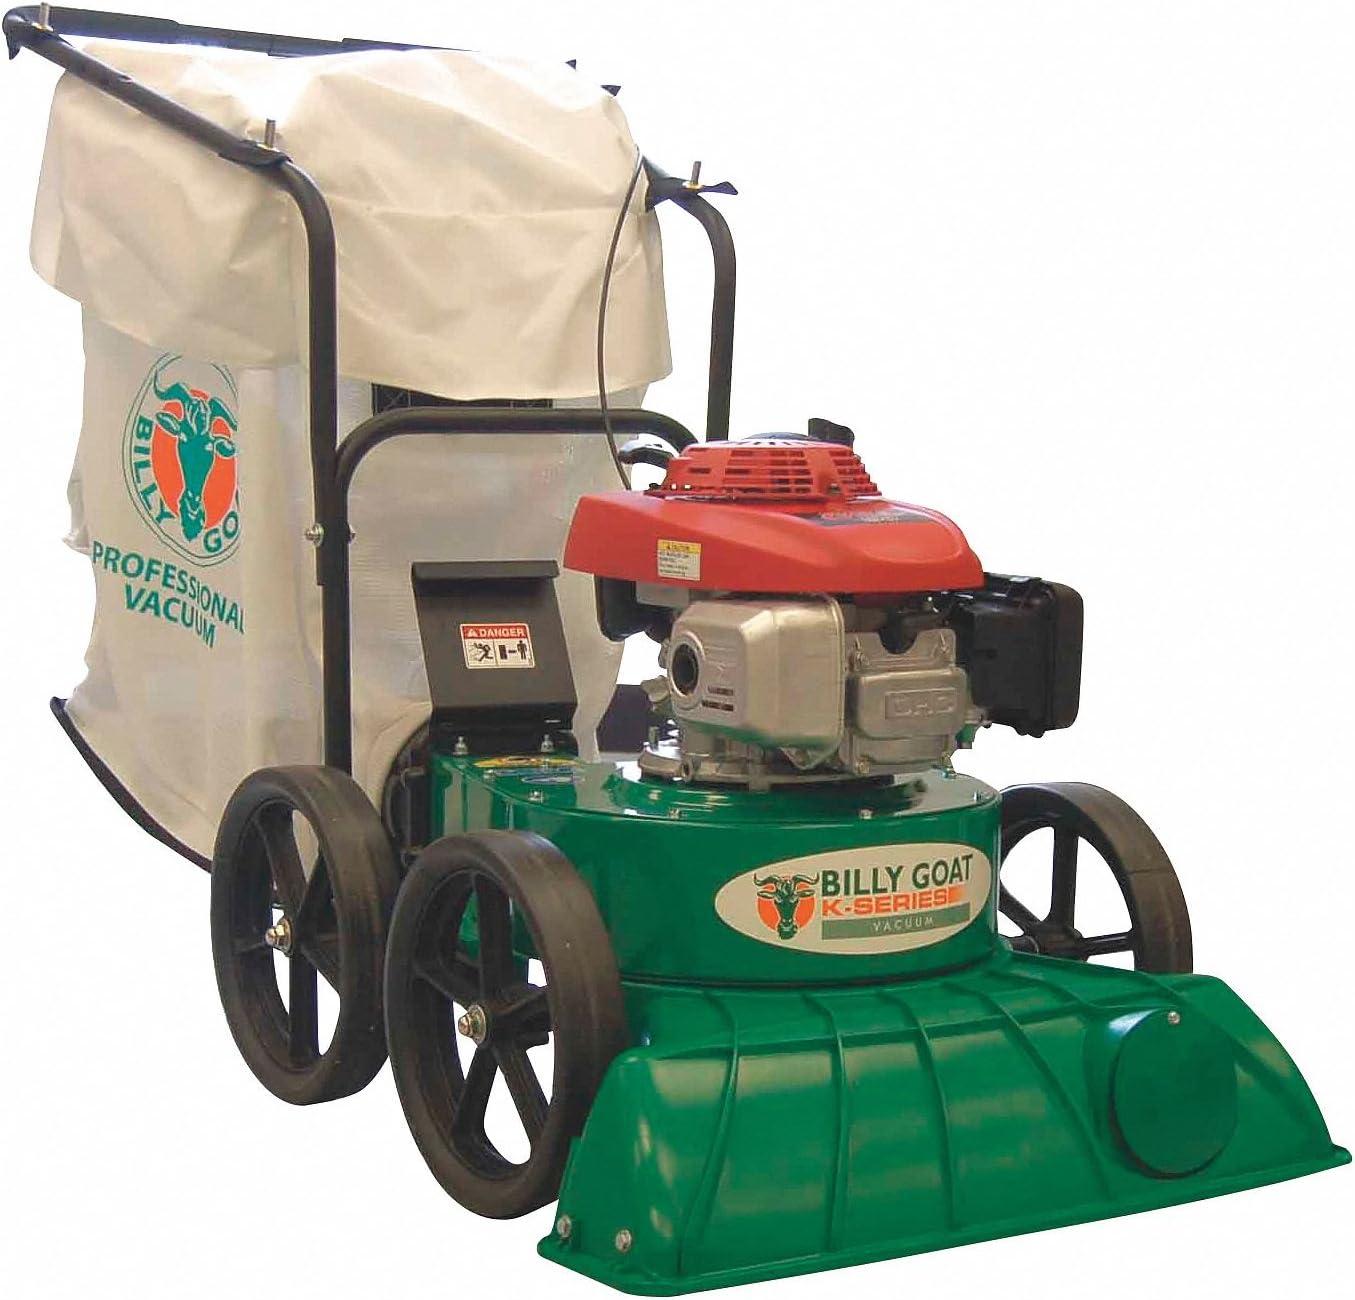 900146-01 Housing Plug Billy Goat KV Series Leaf /& Litter Vacuums